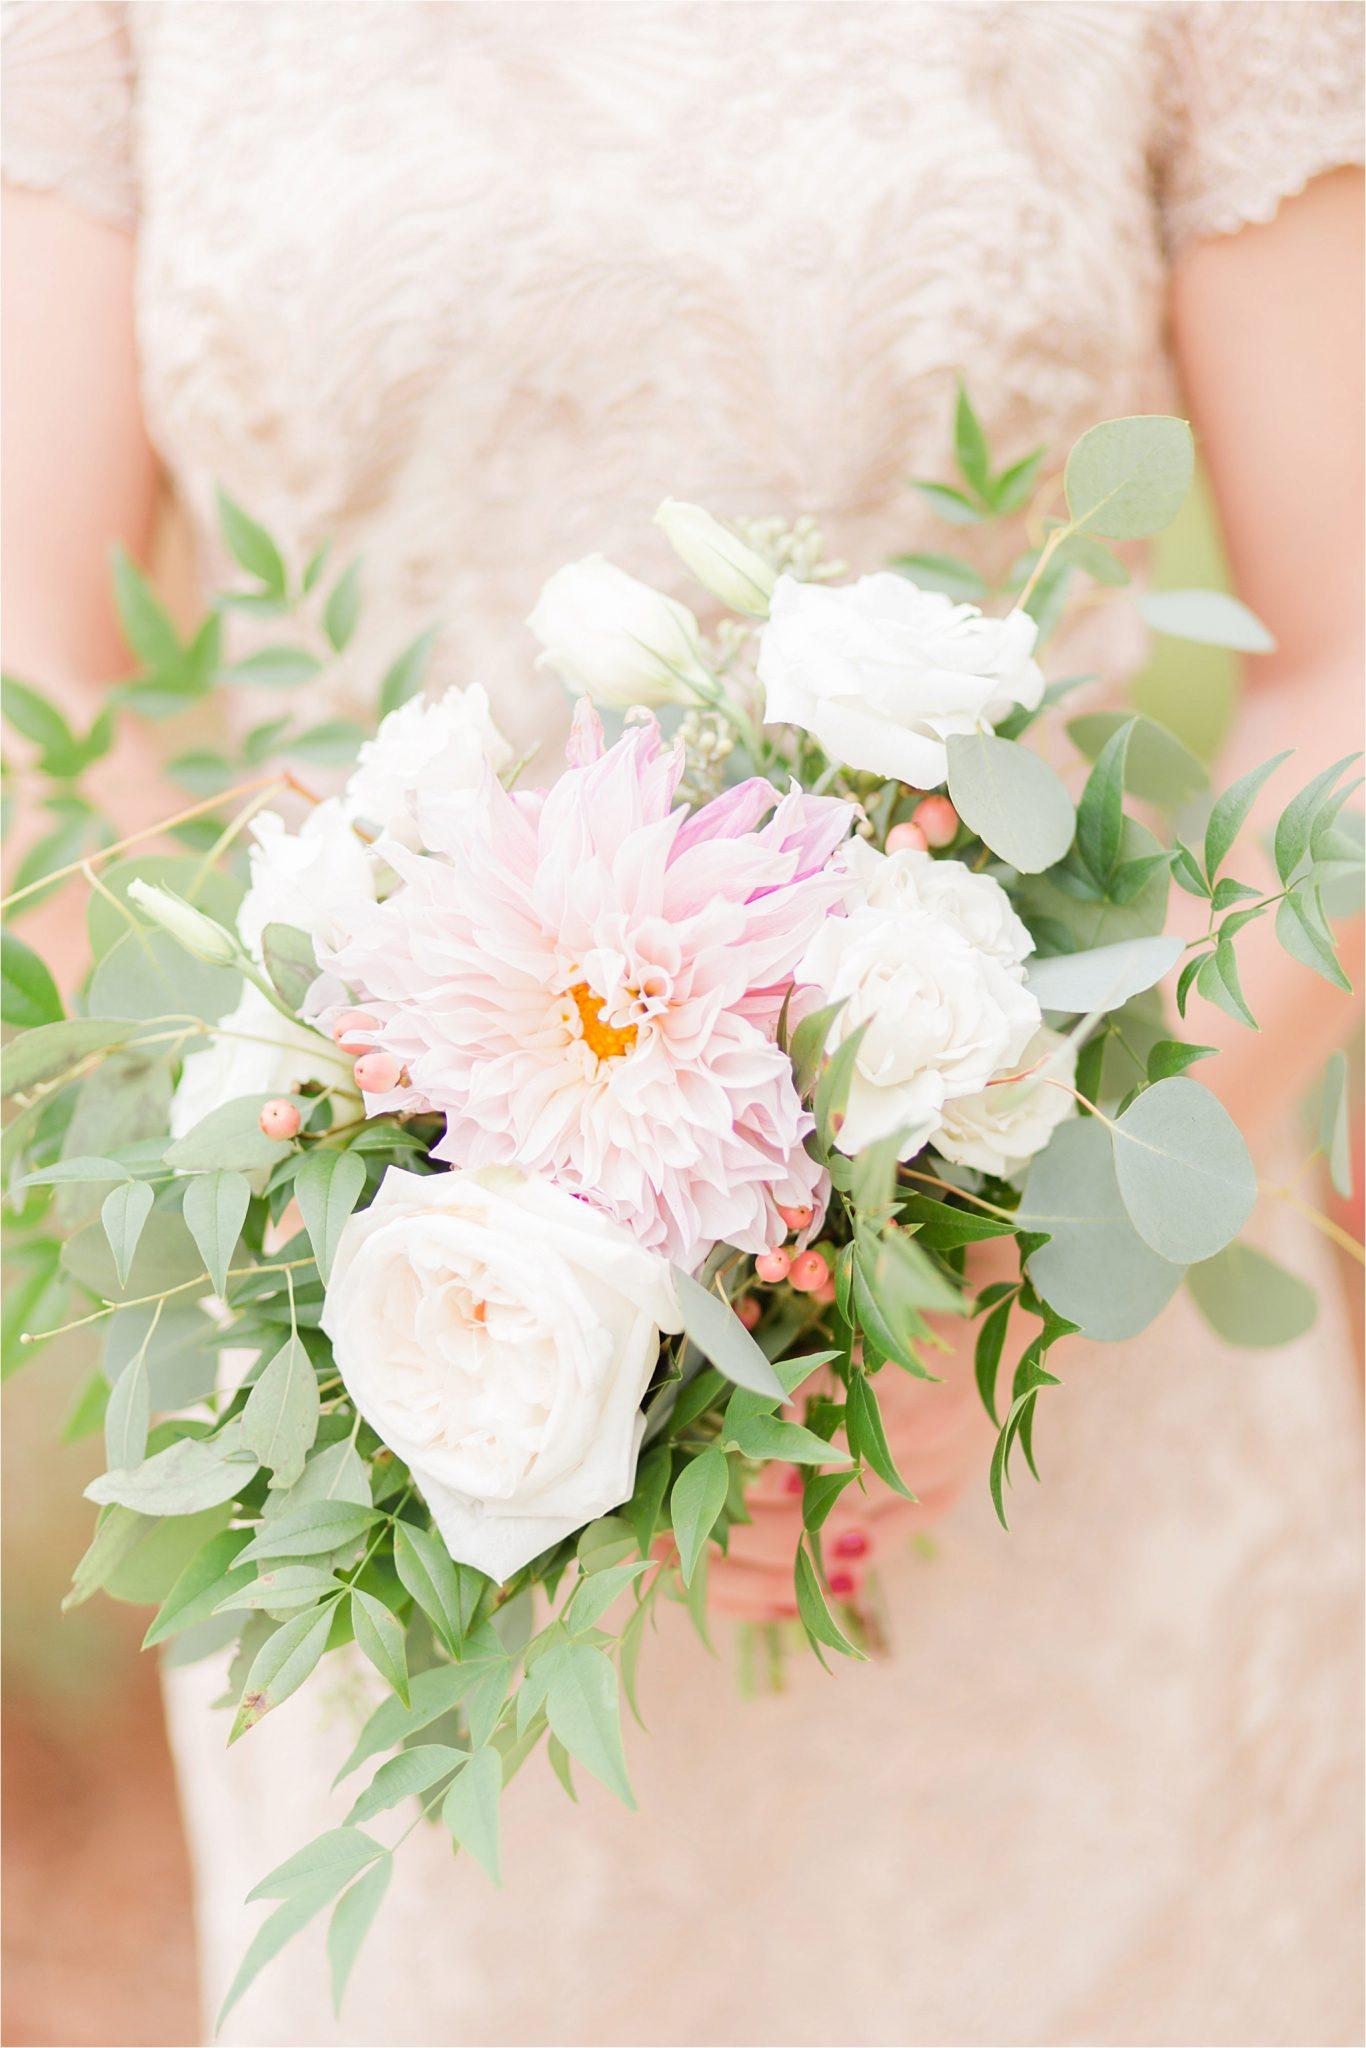 wedding-bridesmaid bouquet-white roses